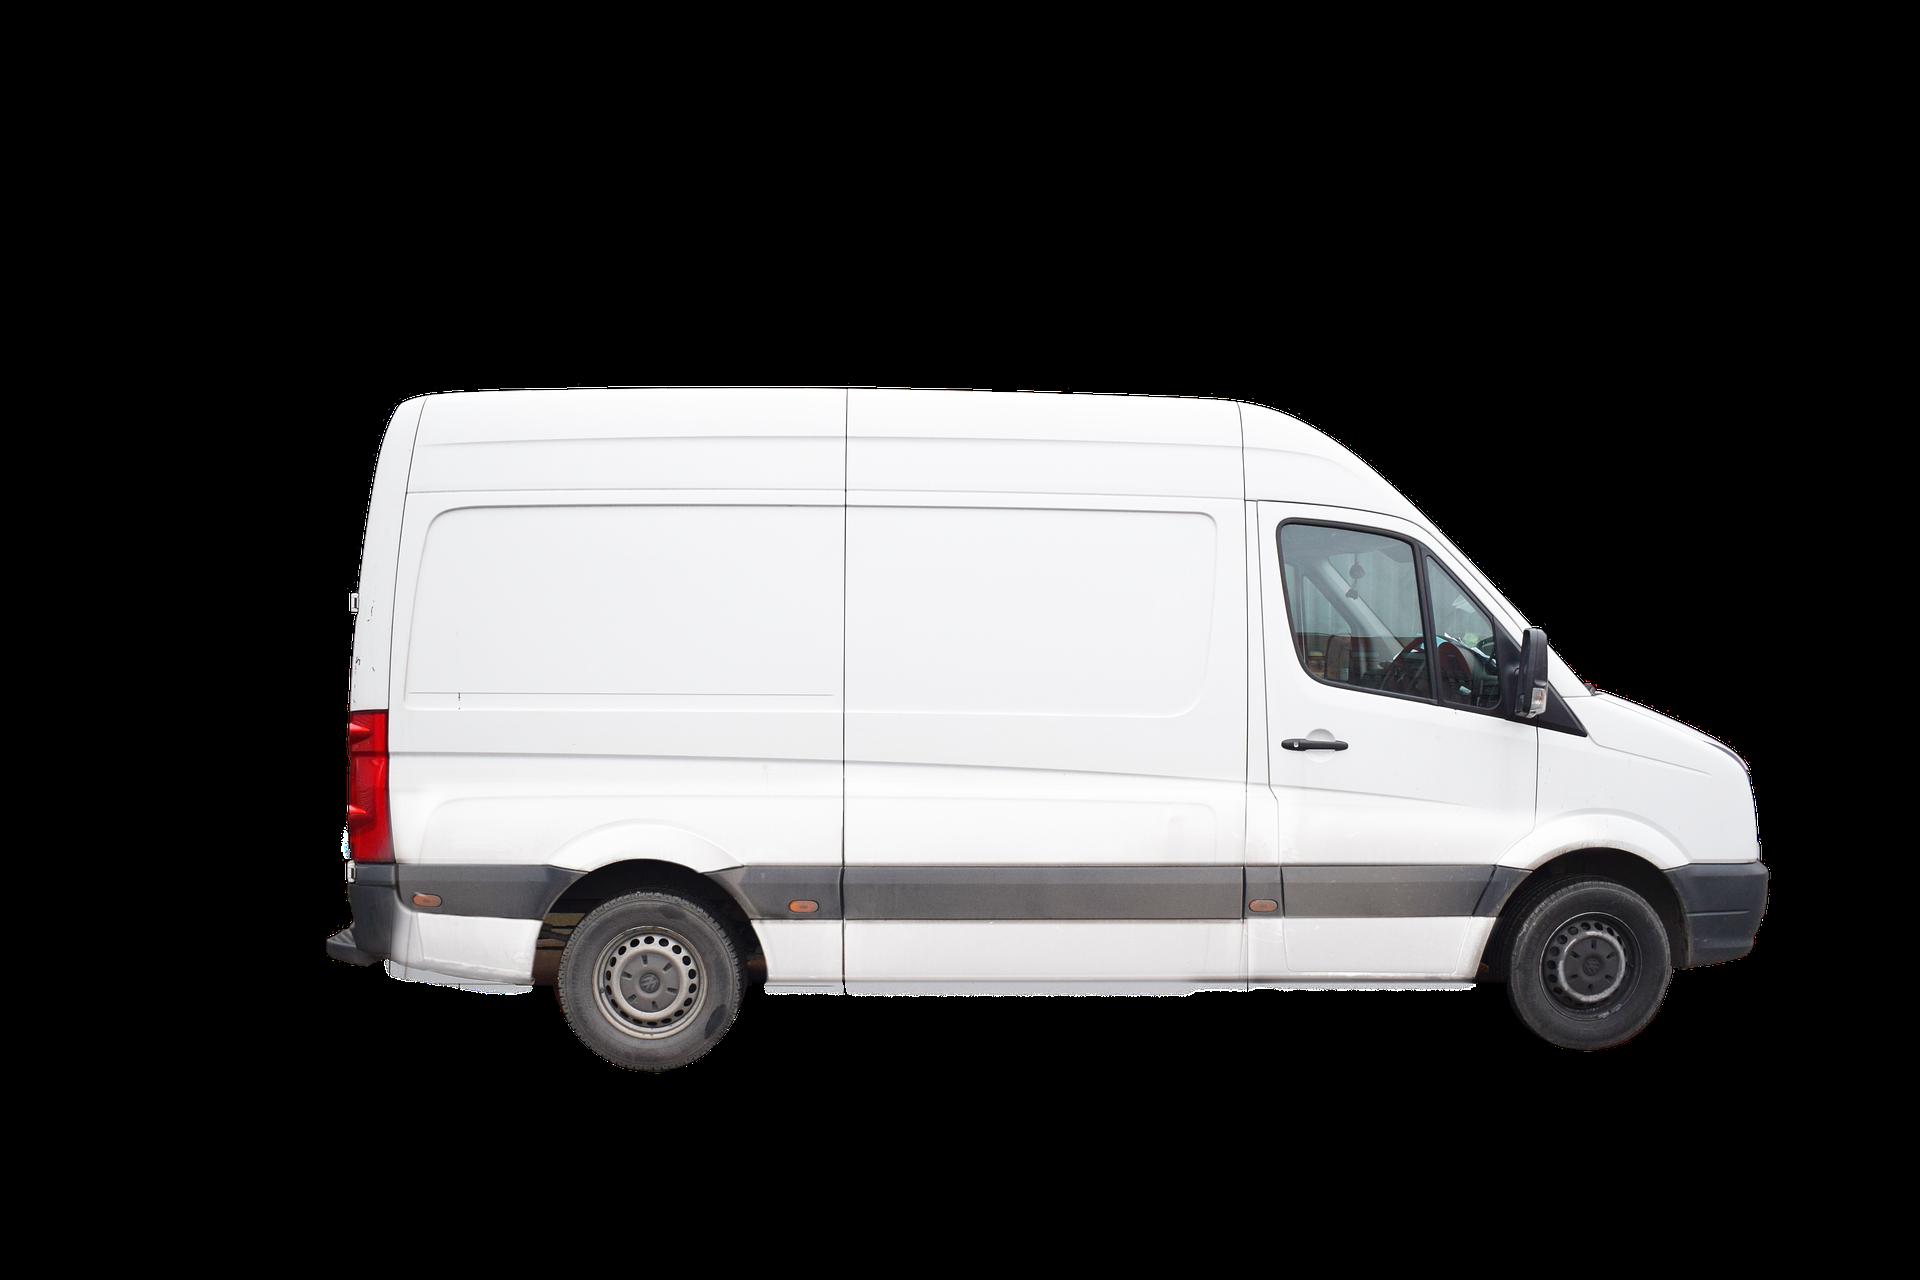 Caravan Supply Chain sprinters